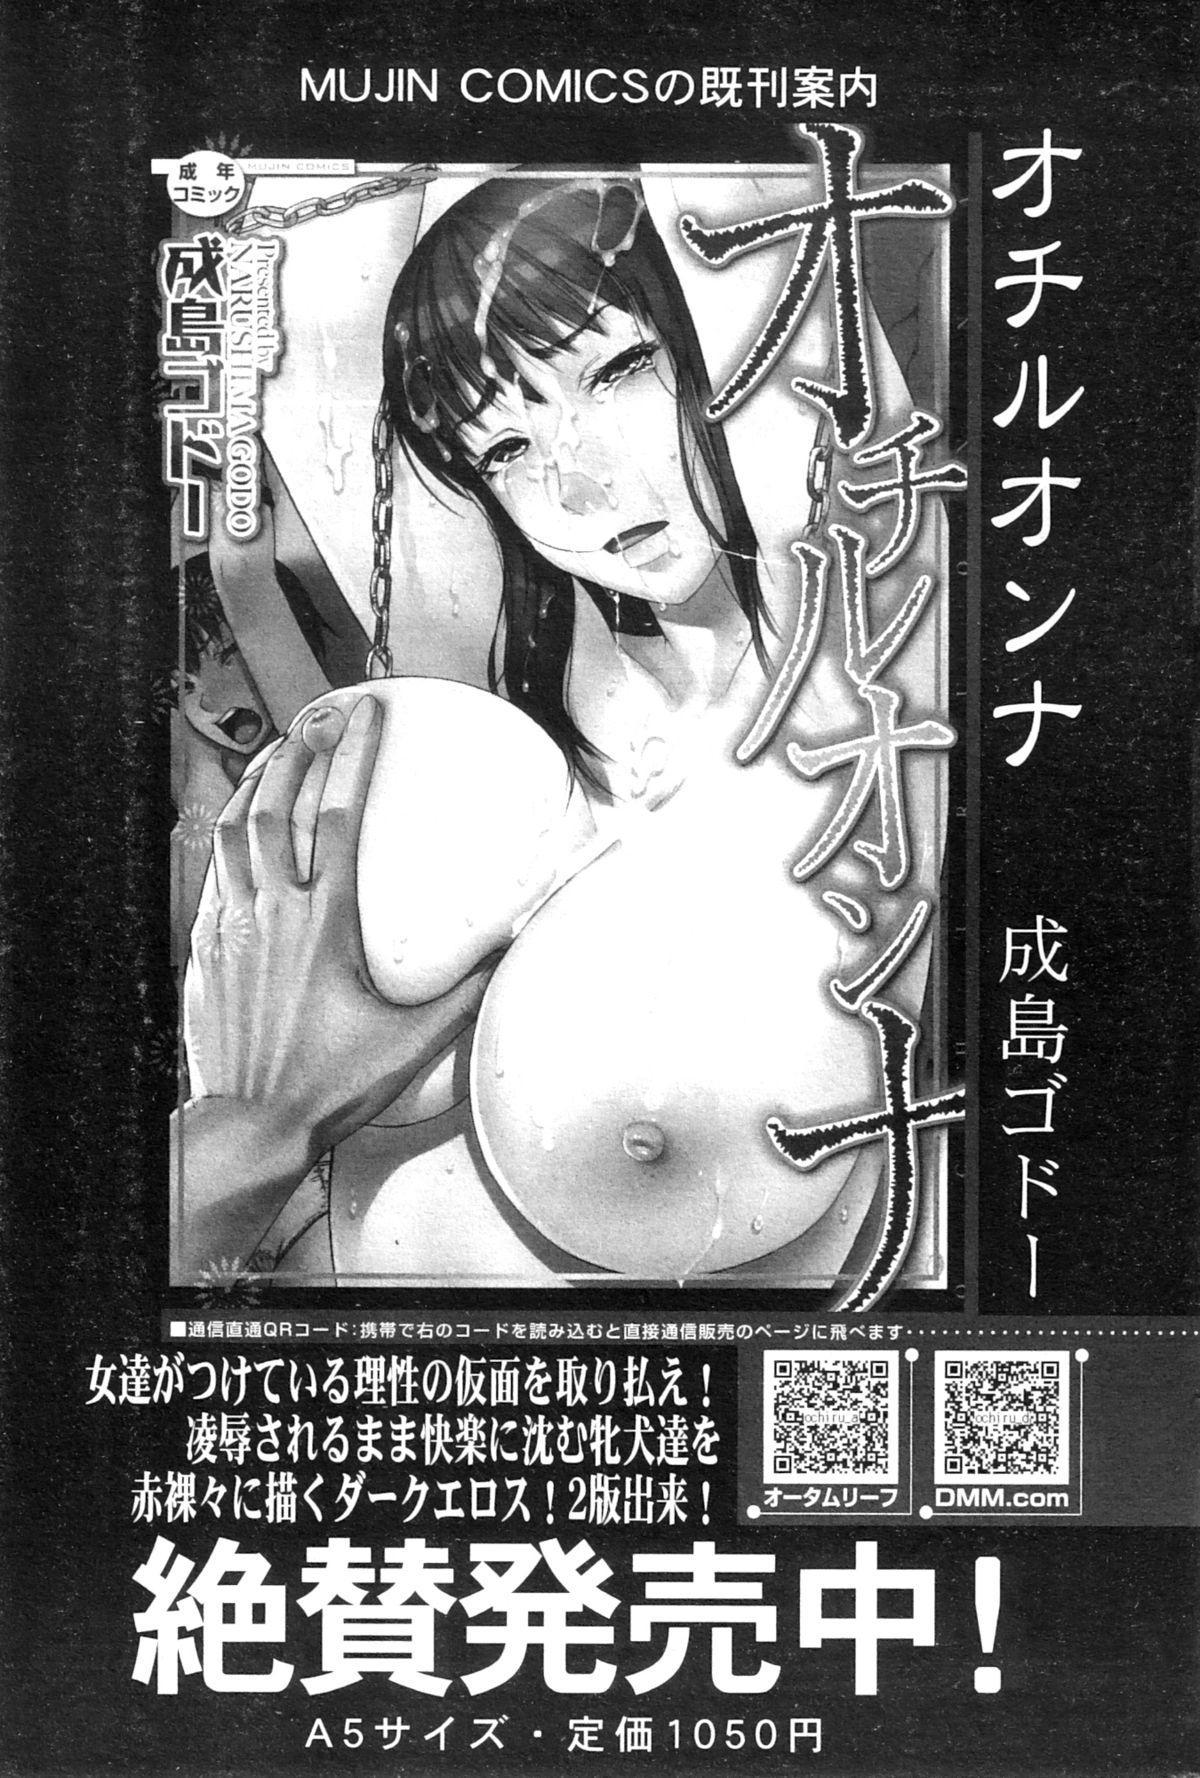 COMIC MILF 2013-02 Vol. 11 245